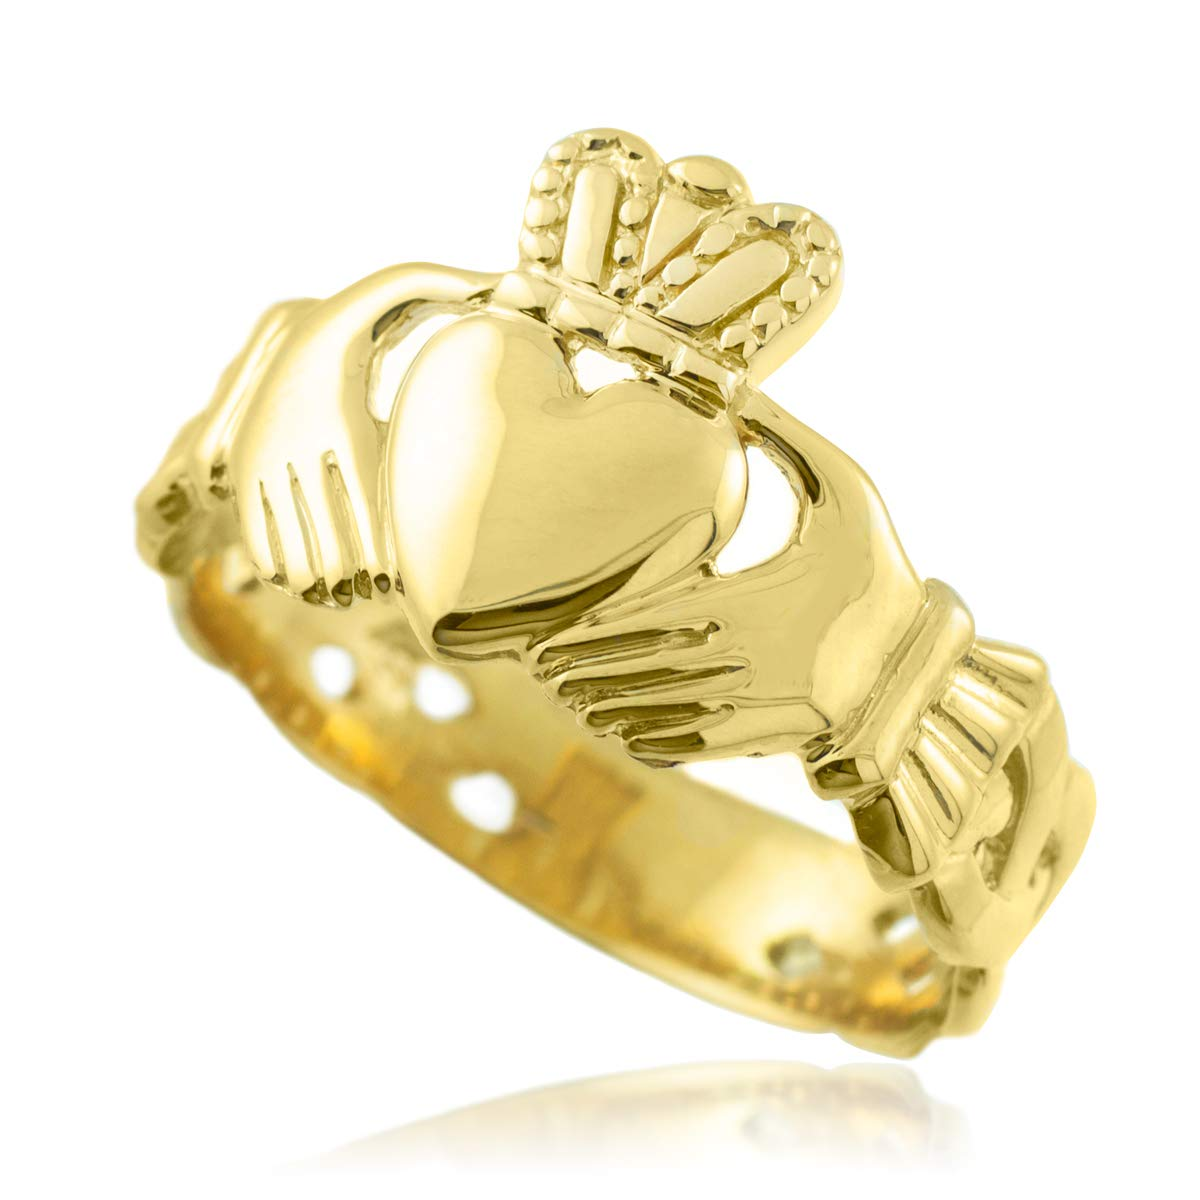 16.75 10k Gold Mens Claddagh Trinity Band Ring